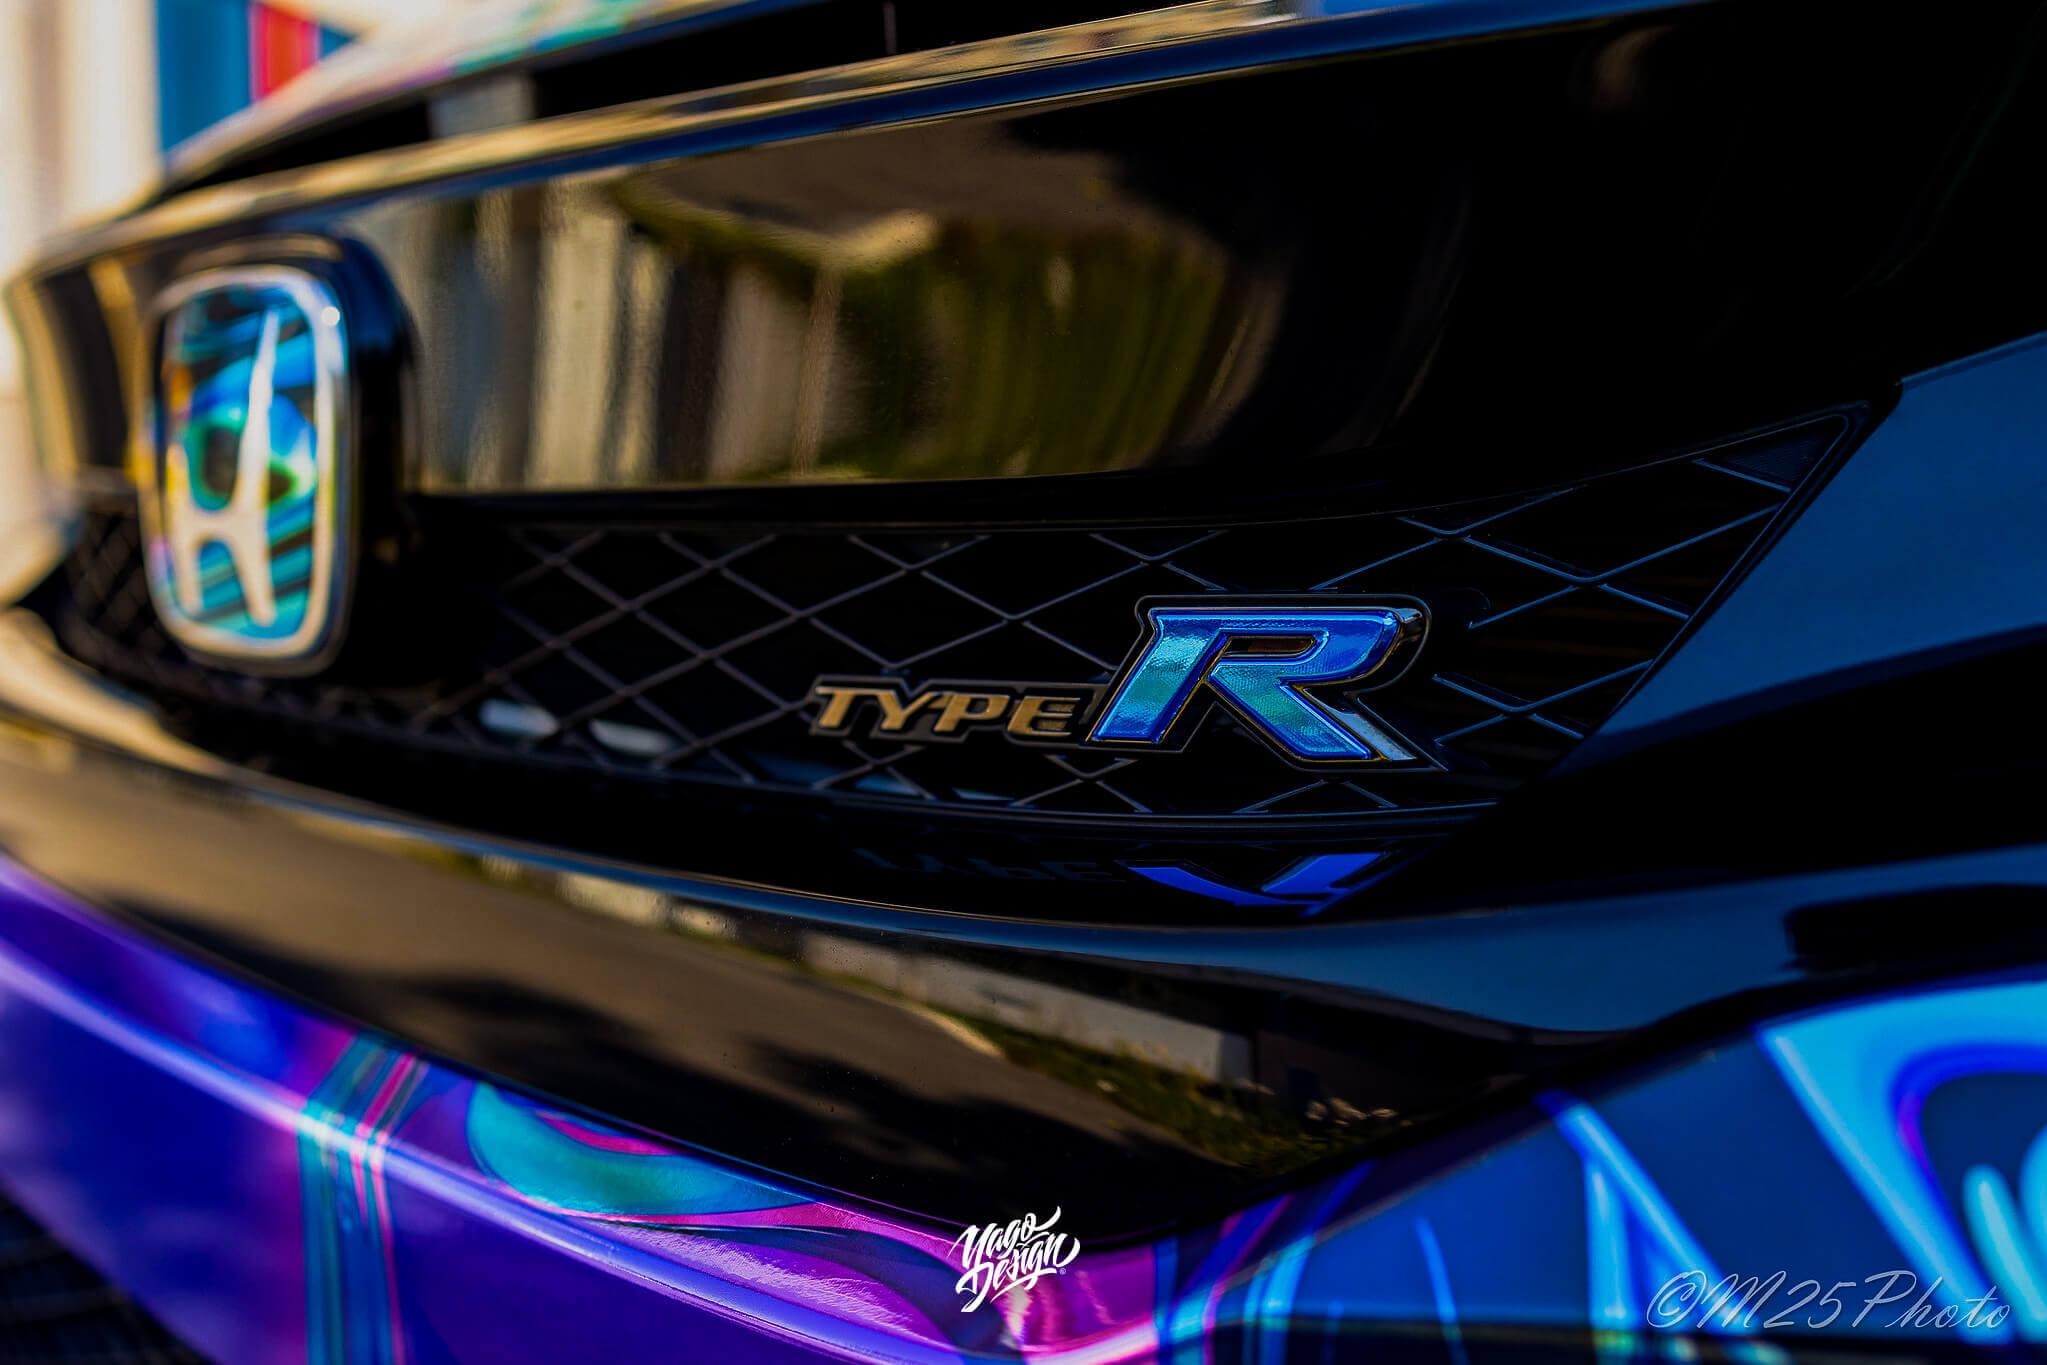 Honda Civic Type R Liquid Design psychodelic by Yagodesign (1)